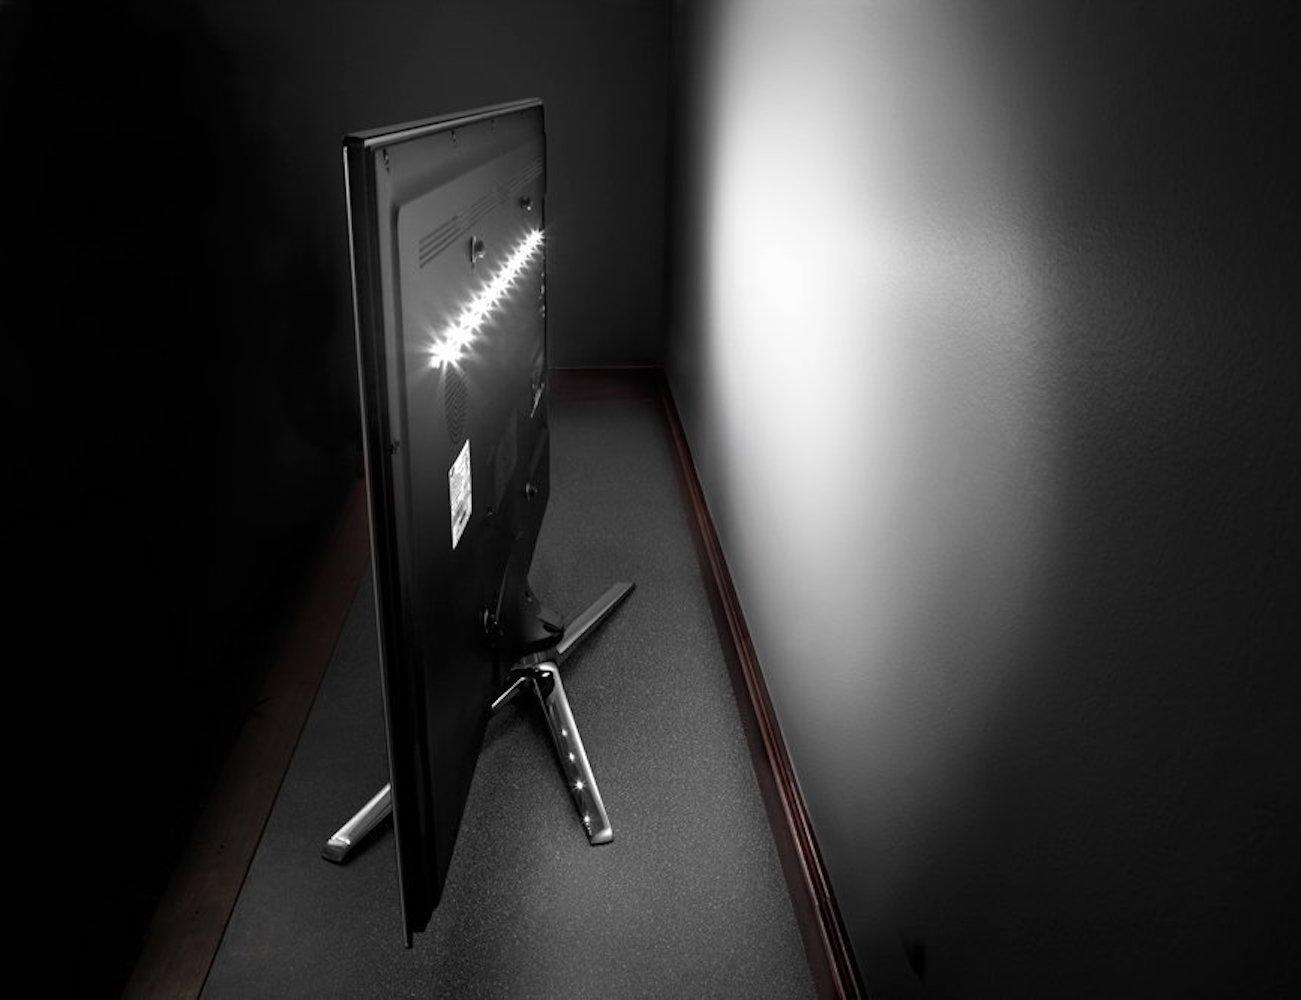 Antec USB Powered HDTV Bias Lighting